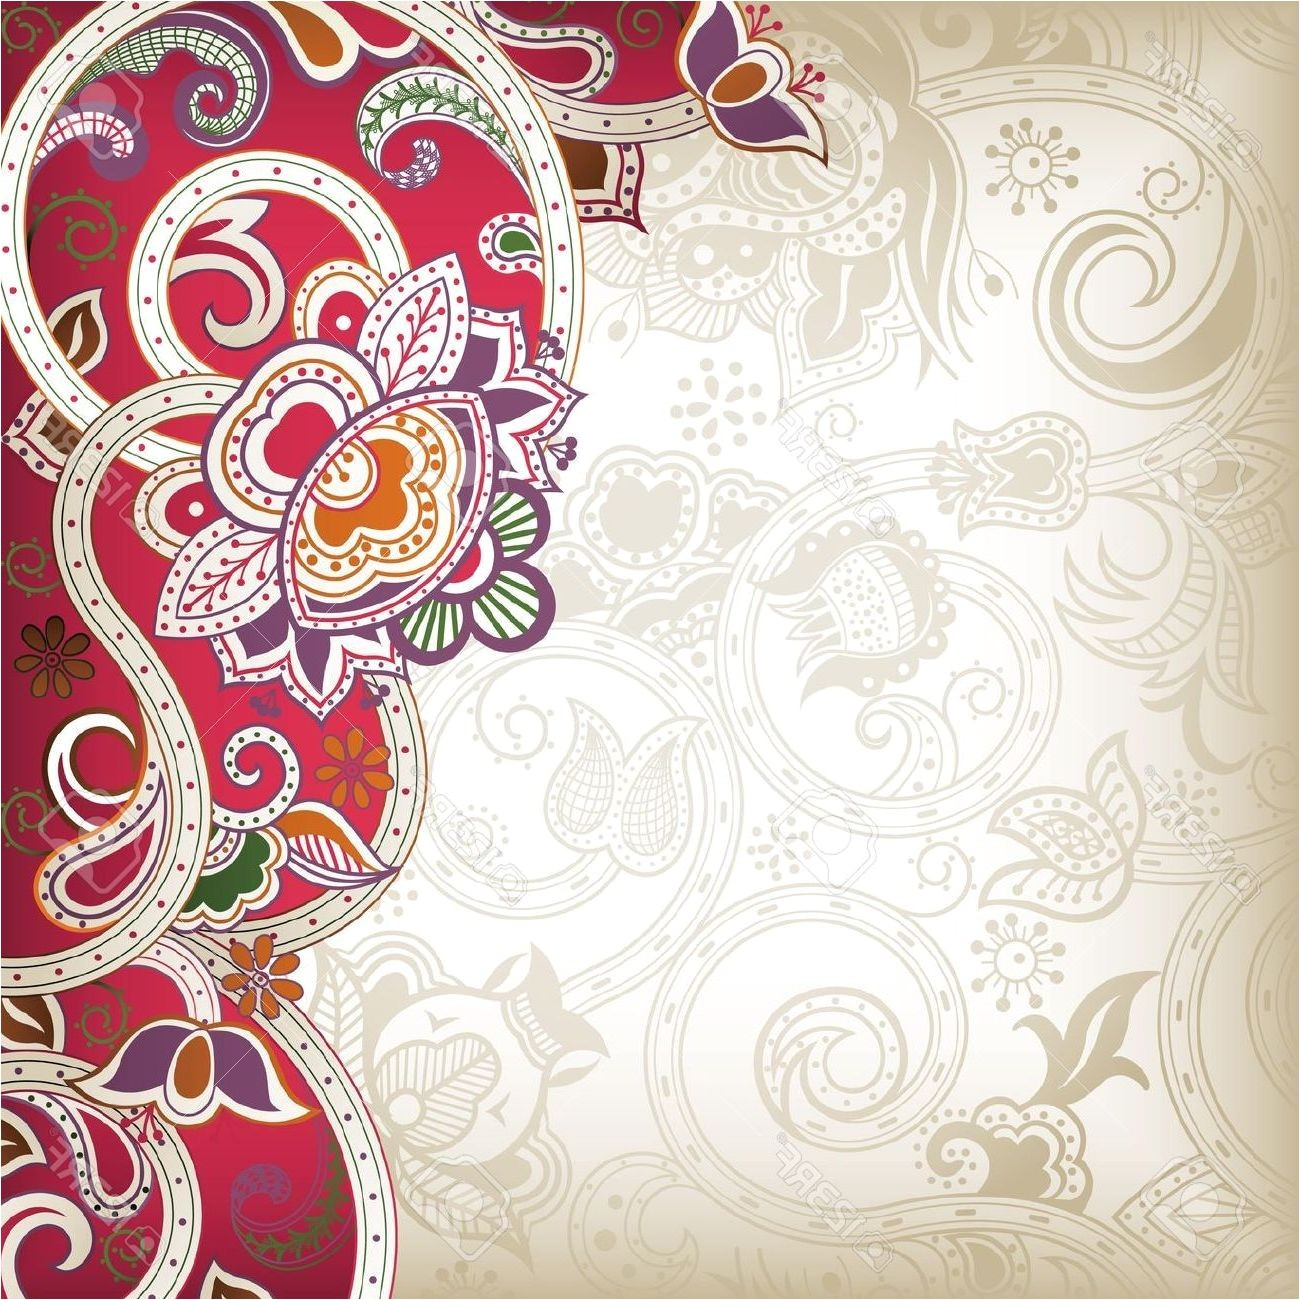 indian wedding invitation background designs free download